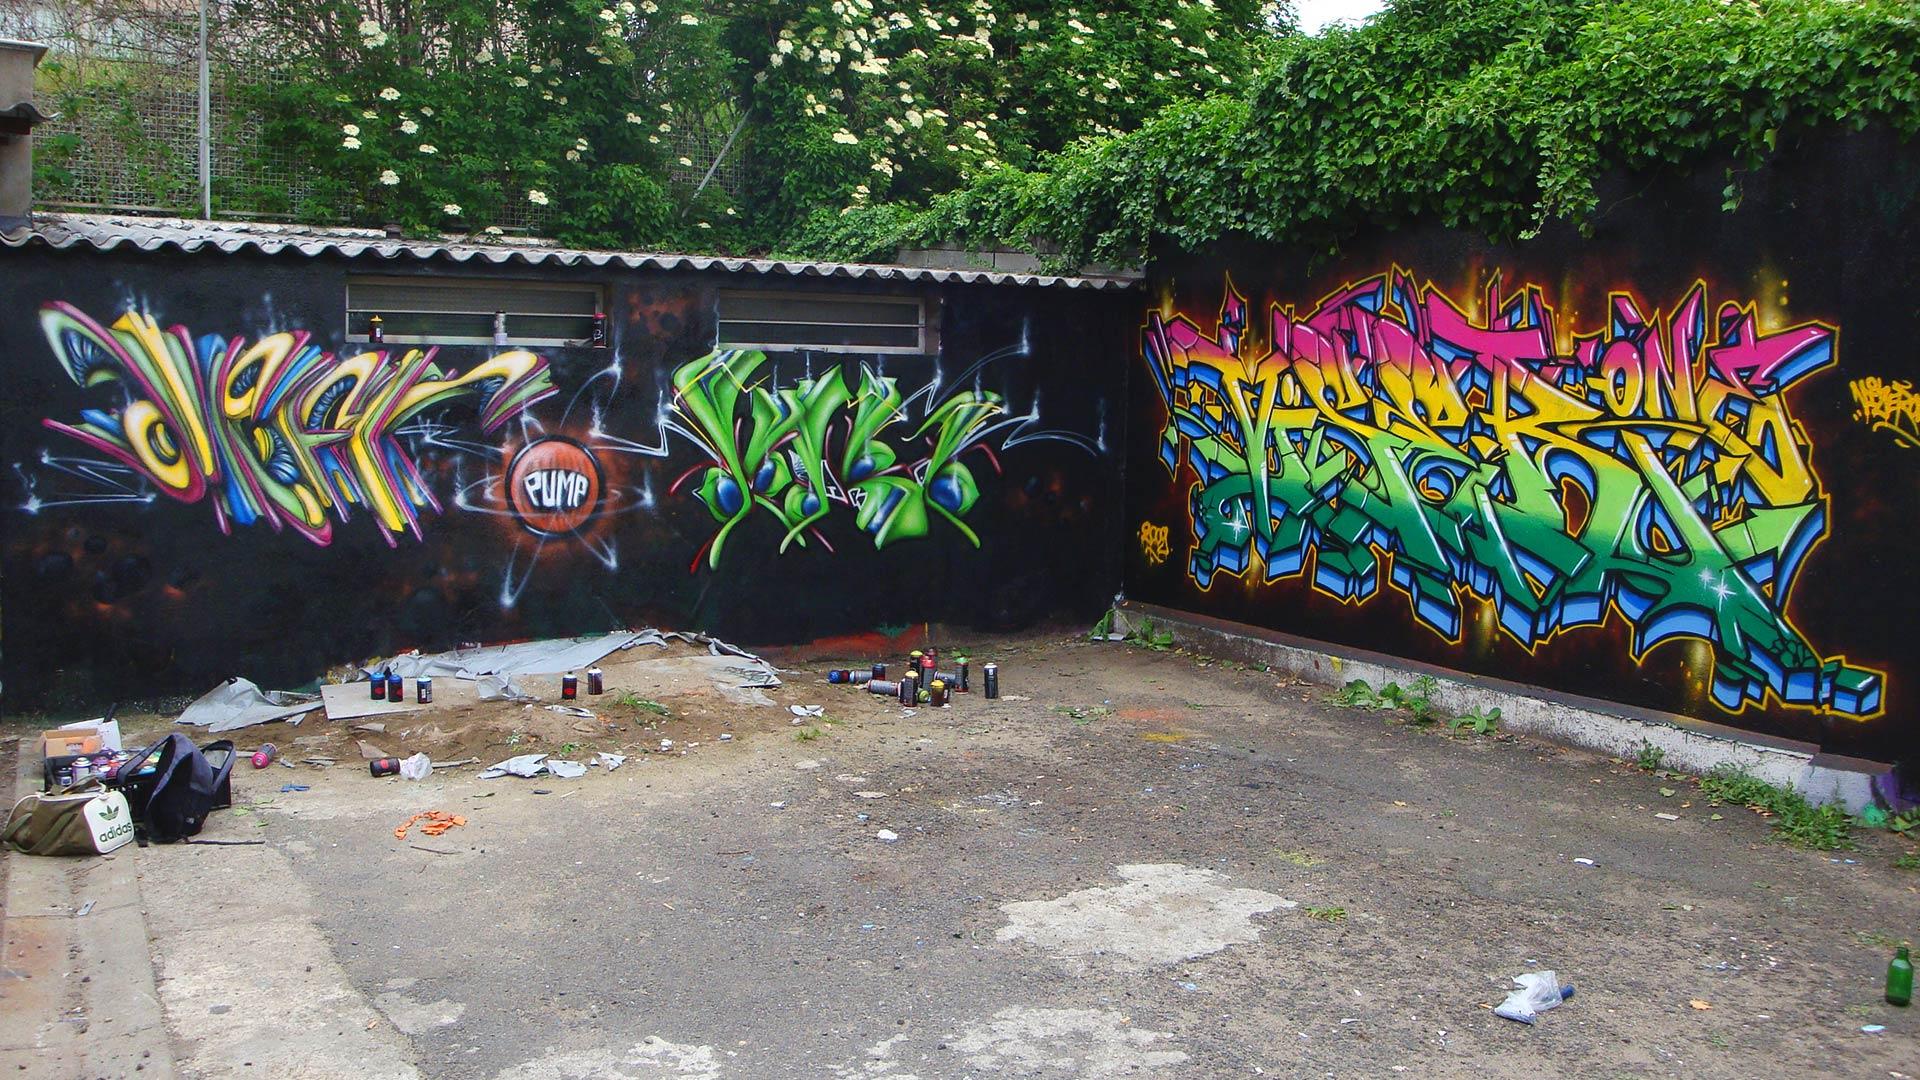 Deft, Waro & Vizer - Graffiti